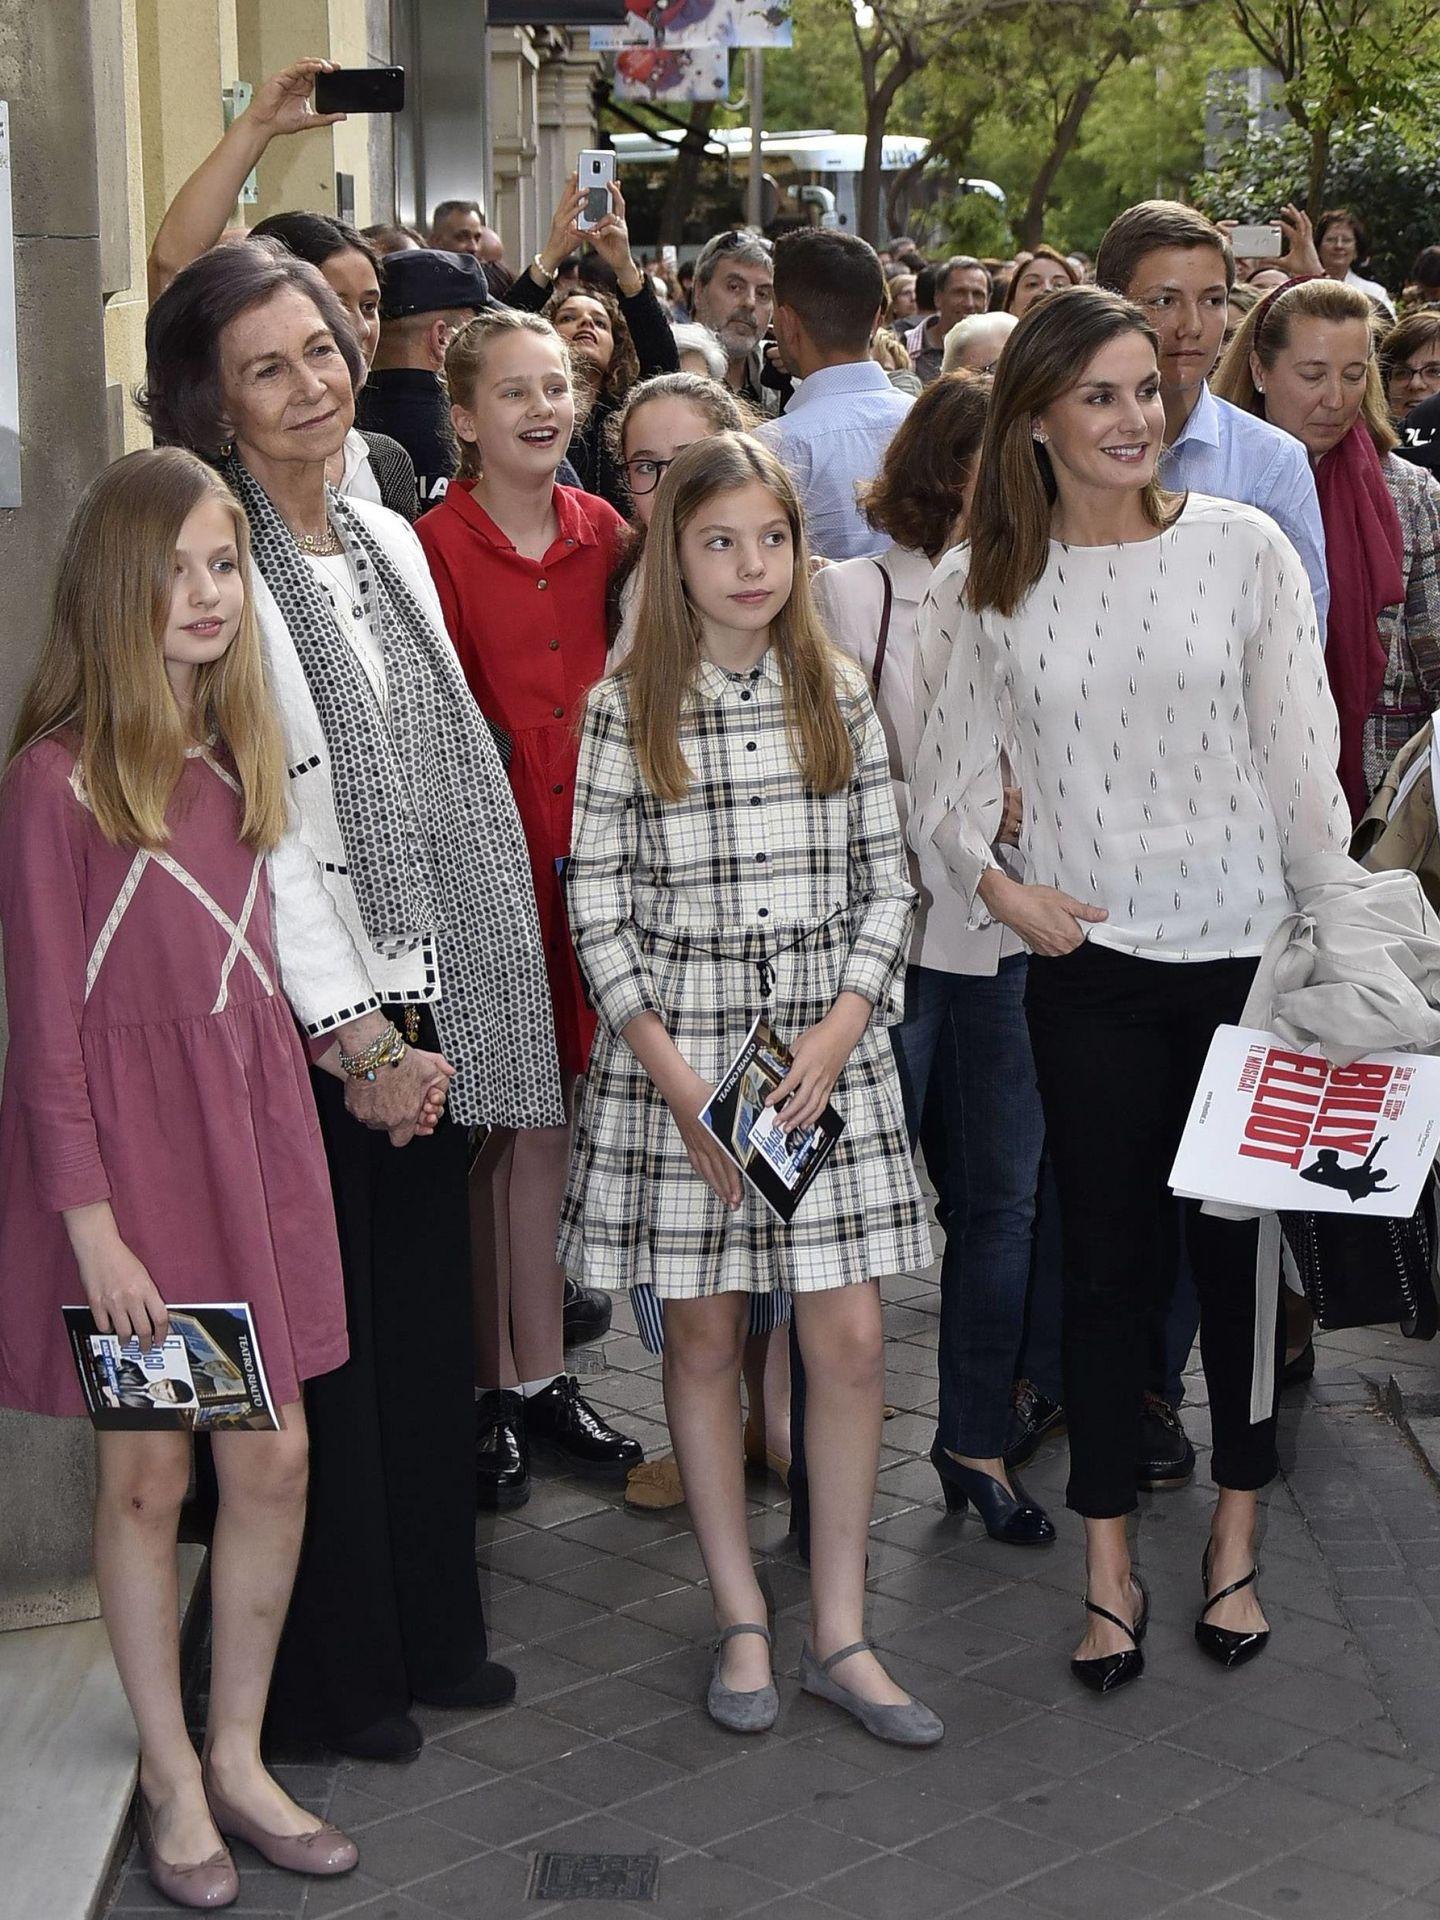 La reina Sofía con sus nietas: Leonor, Sofía e Irene (de rojo) y la reina Letizia. (Cordon Press)